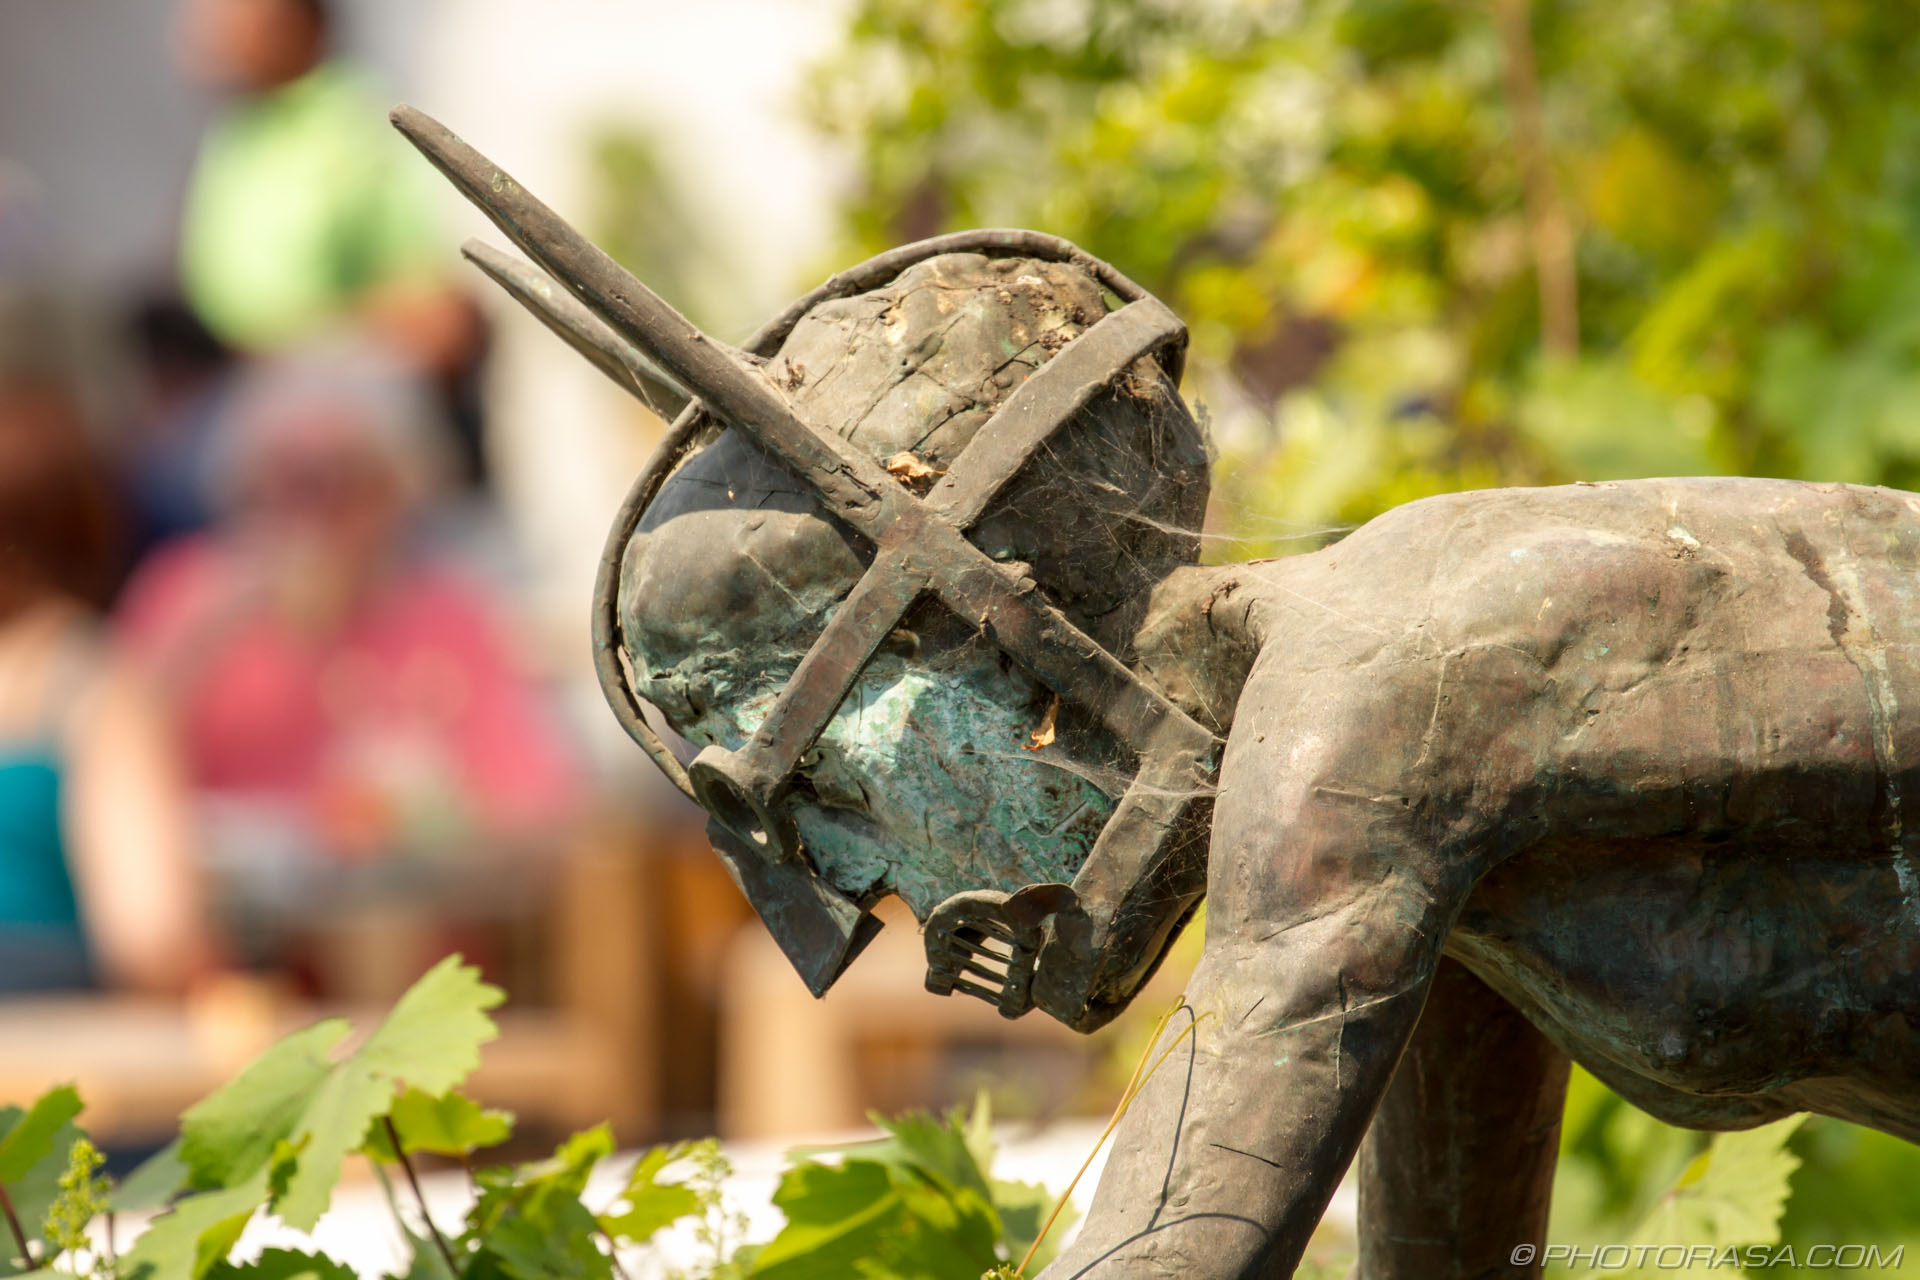 https://photorasa.com/garden-sculptures/head-of-pagan-reveller/